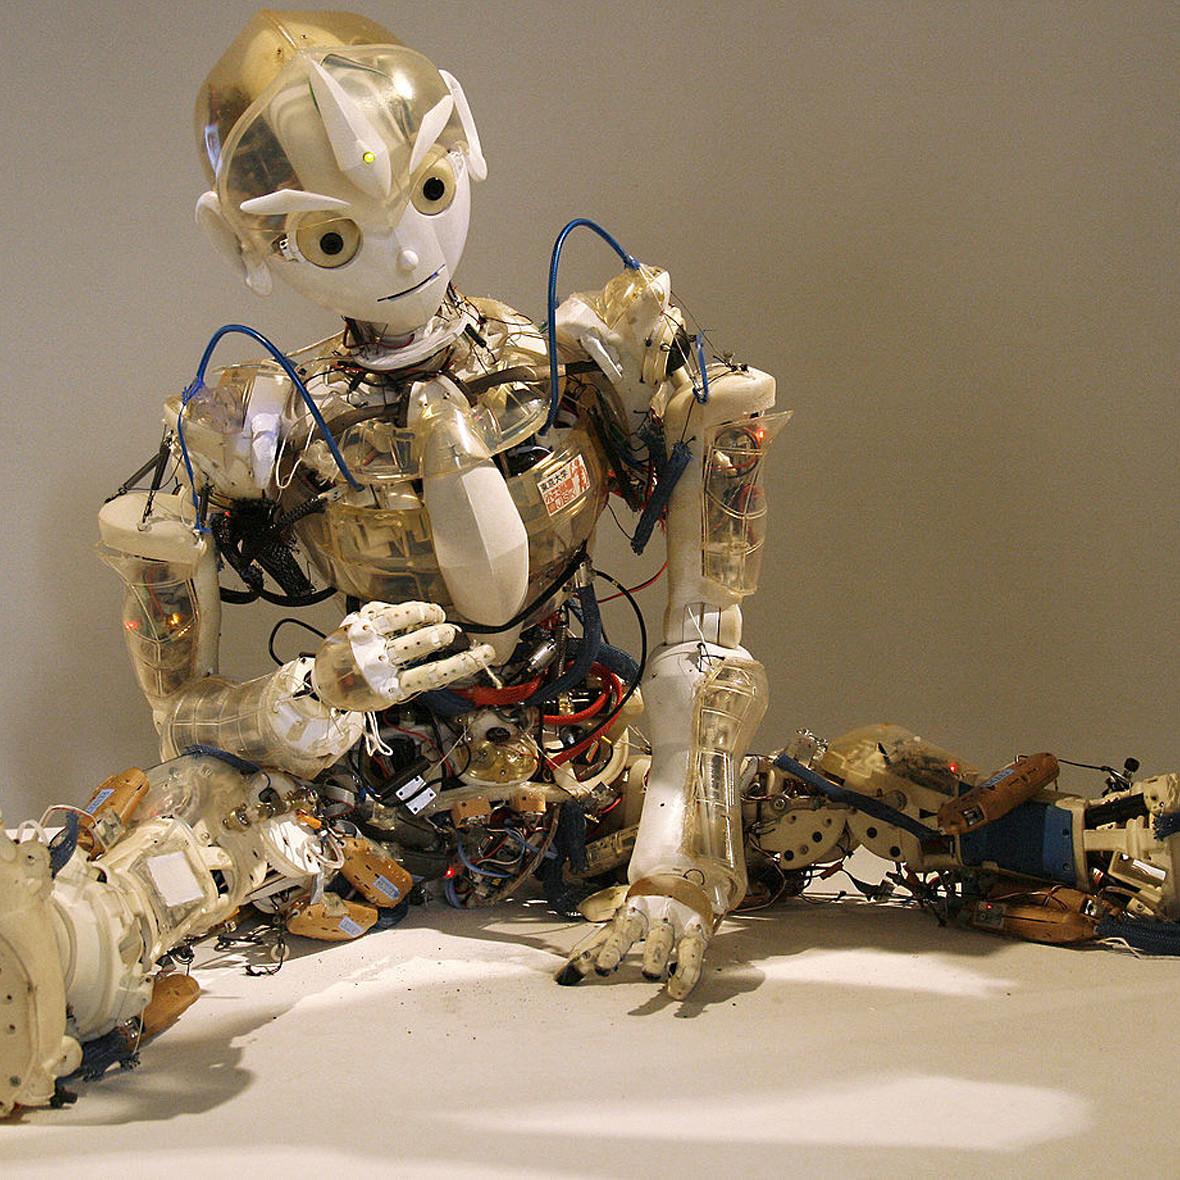 Roboter mit emorionaler Intelligenz